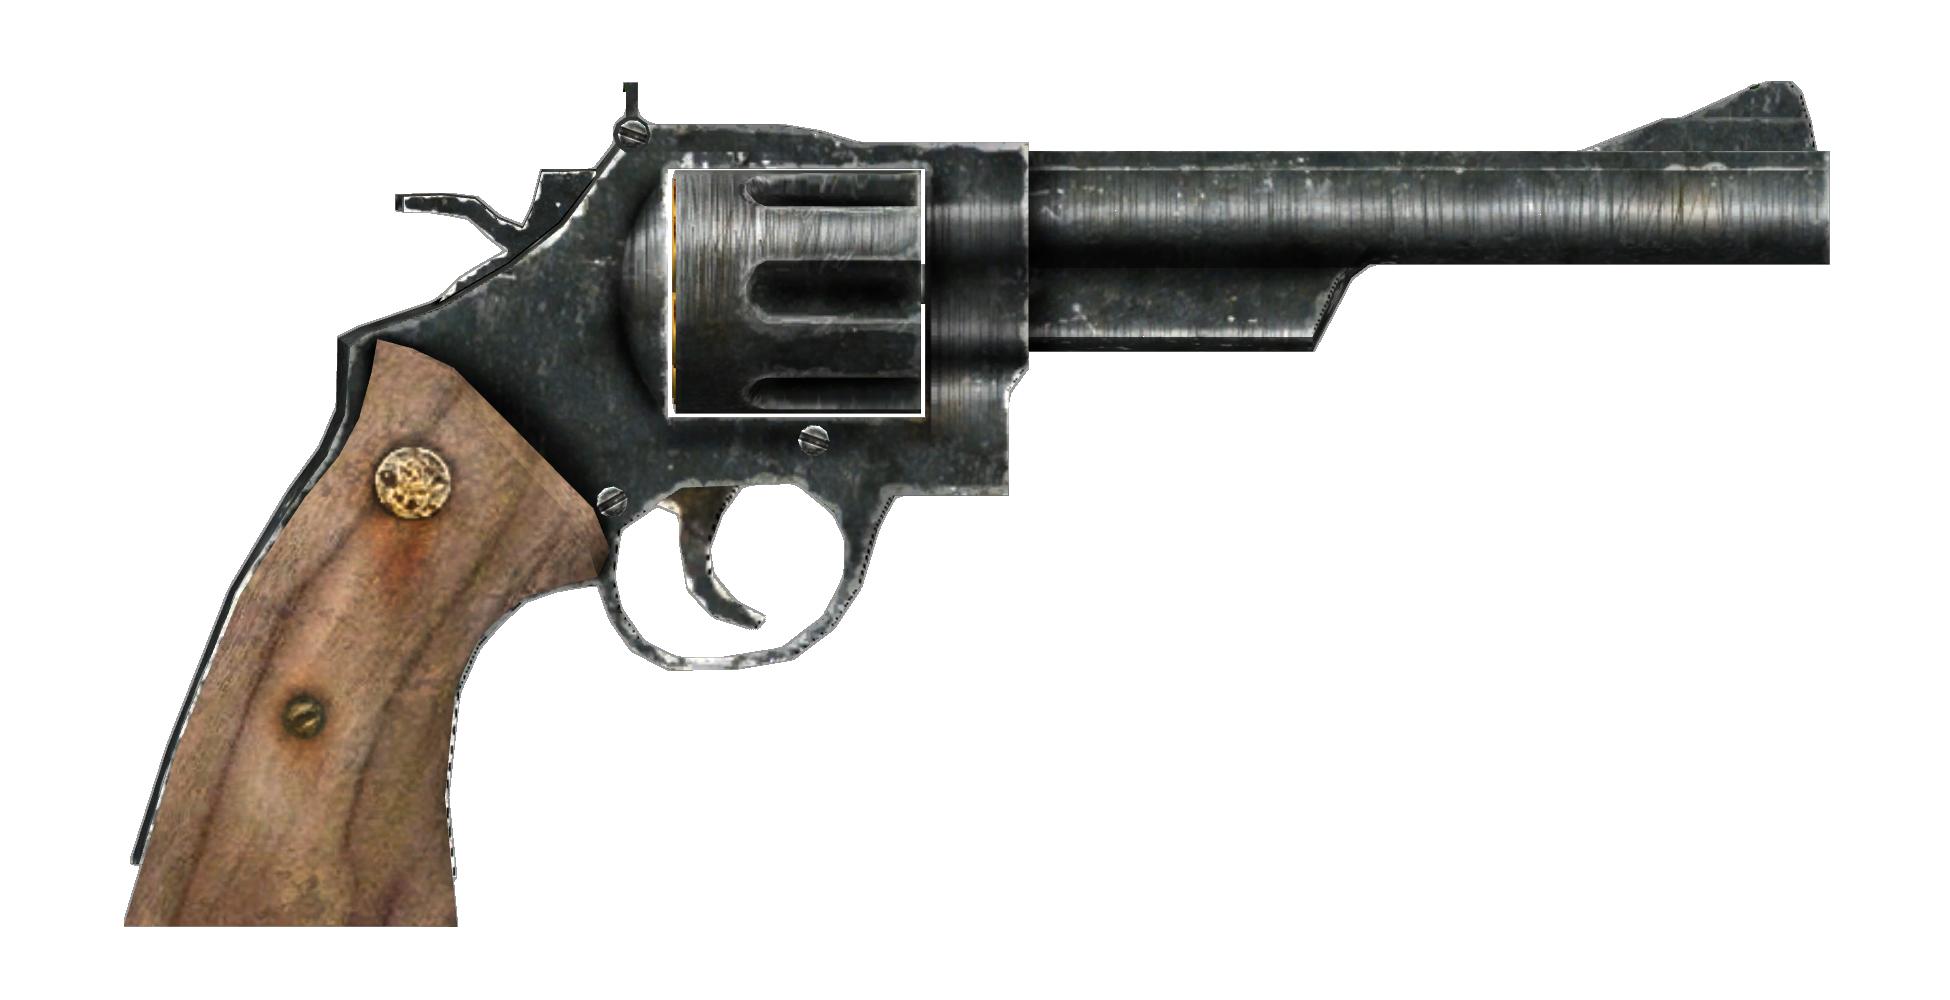 44 Magnum revolver (Fallout: New Vegas) | Fallout Wiki